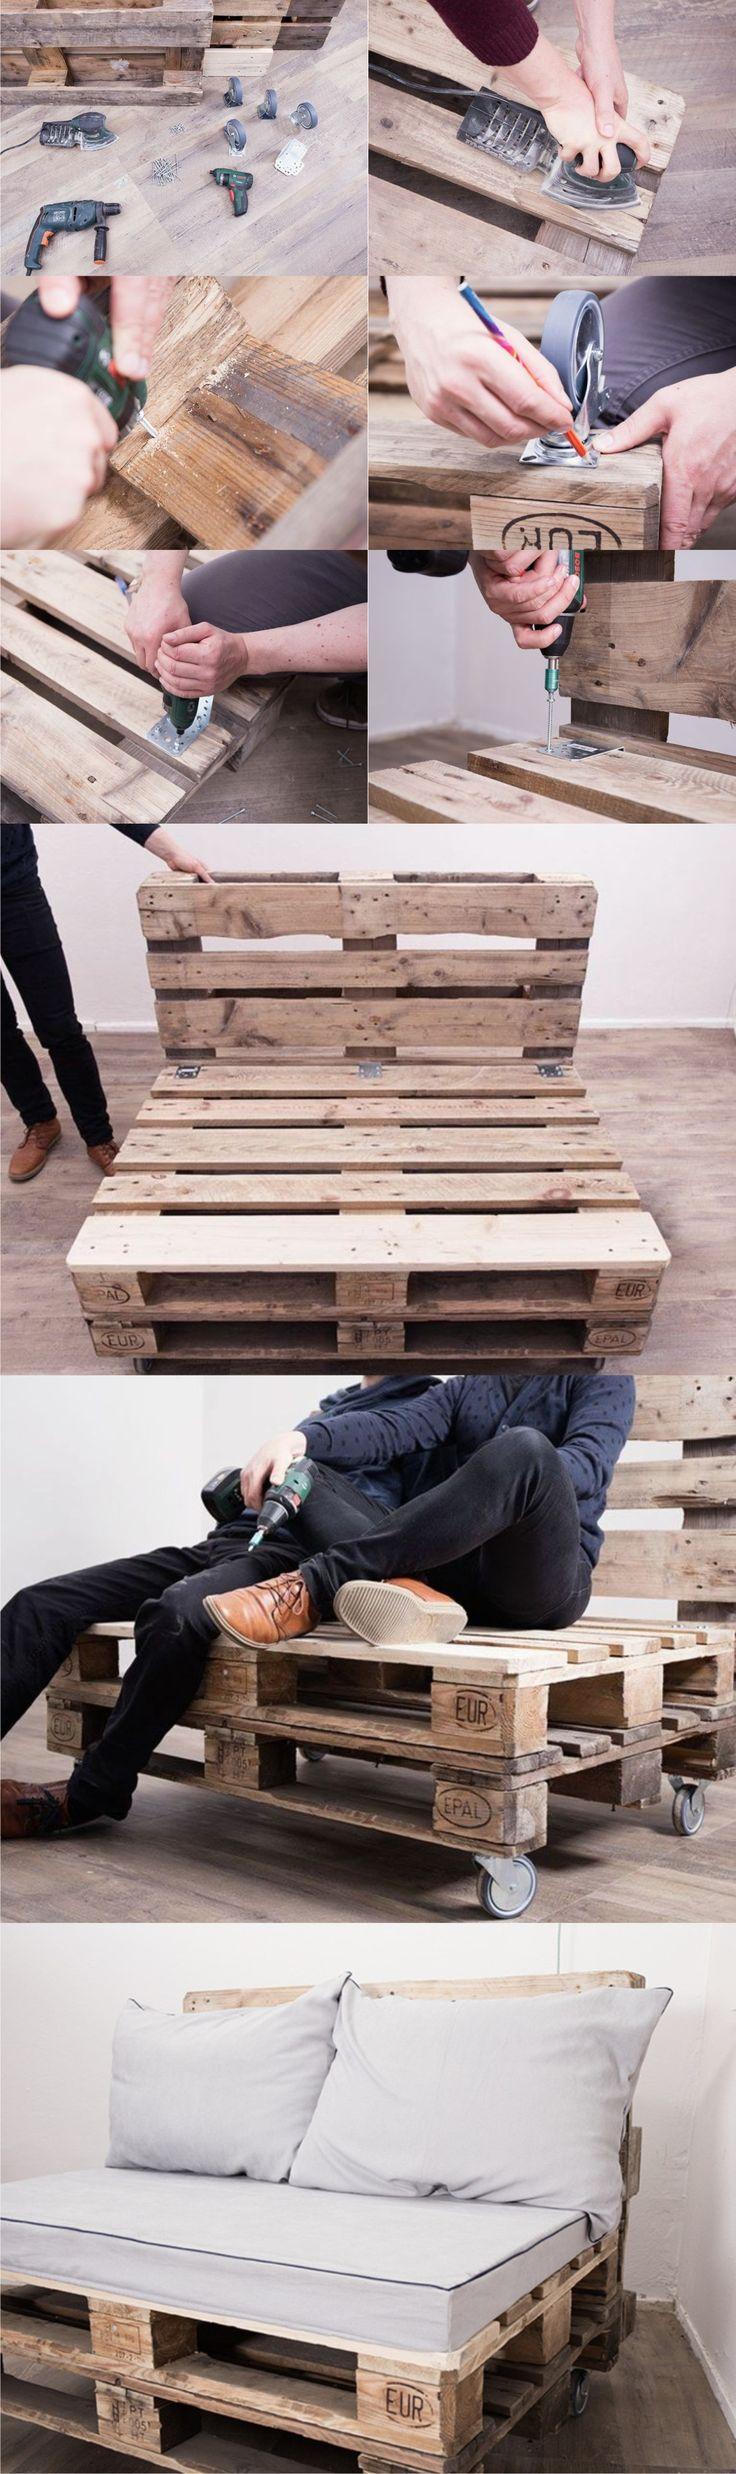 Sofá con palés / Vía http://de.dawanda.com/  #idea #palets #pallets